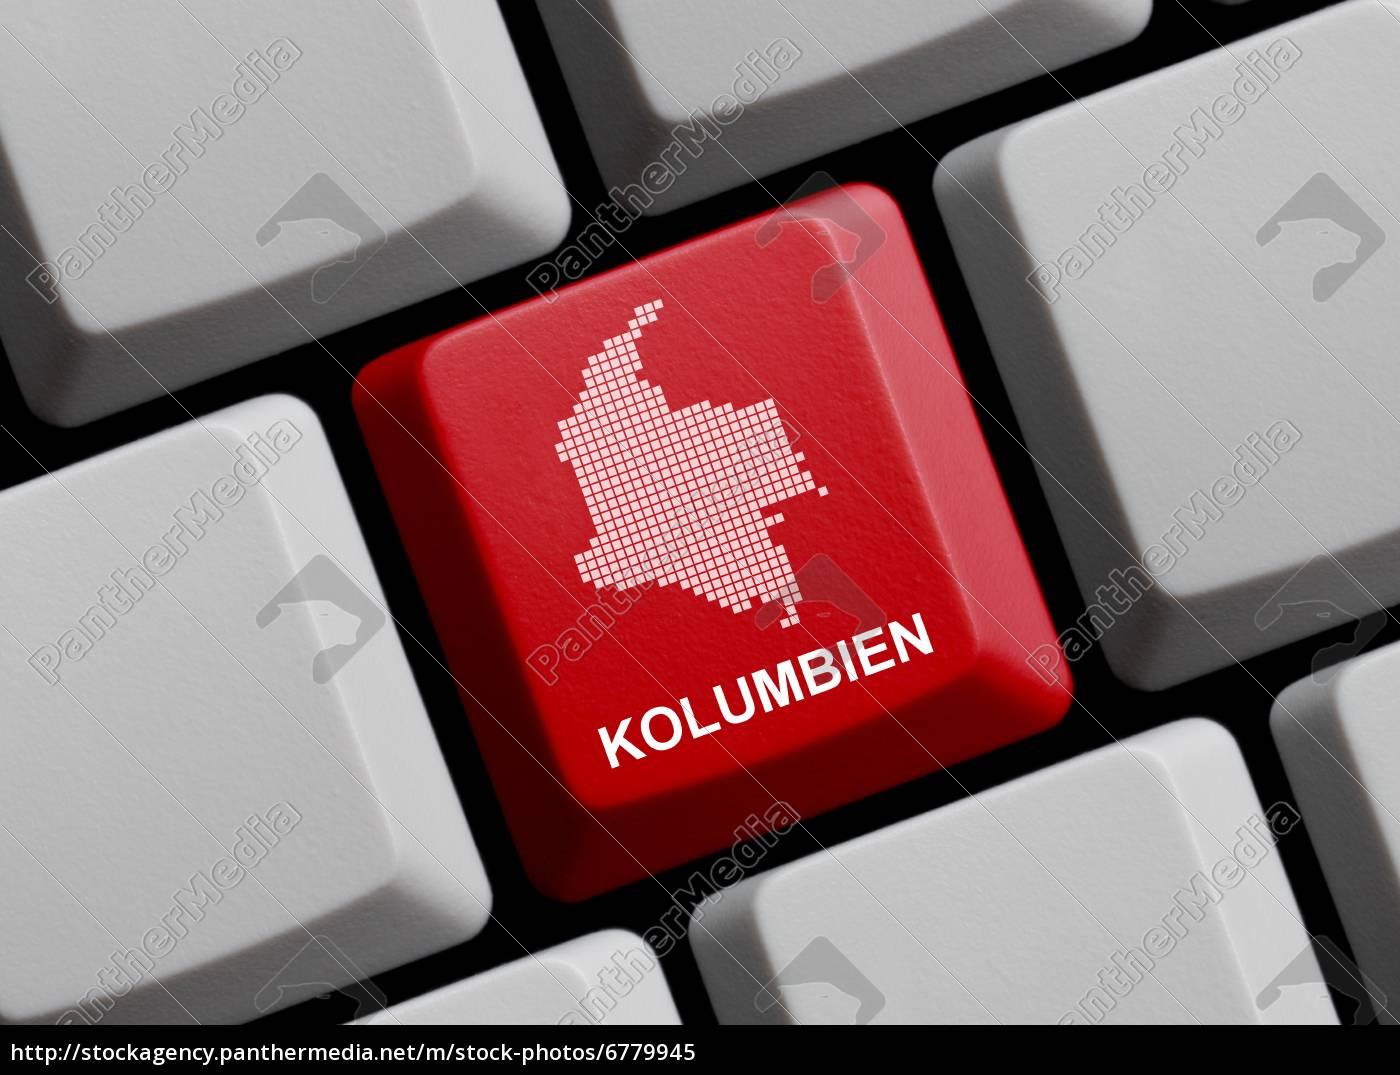 Kolumbien - Umriss auf Tastatur - Lizenzfreies Bild - #6779945 ...